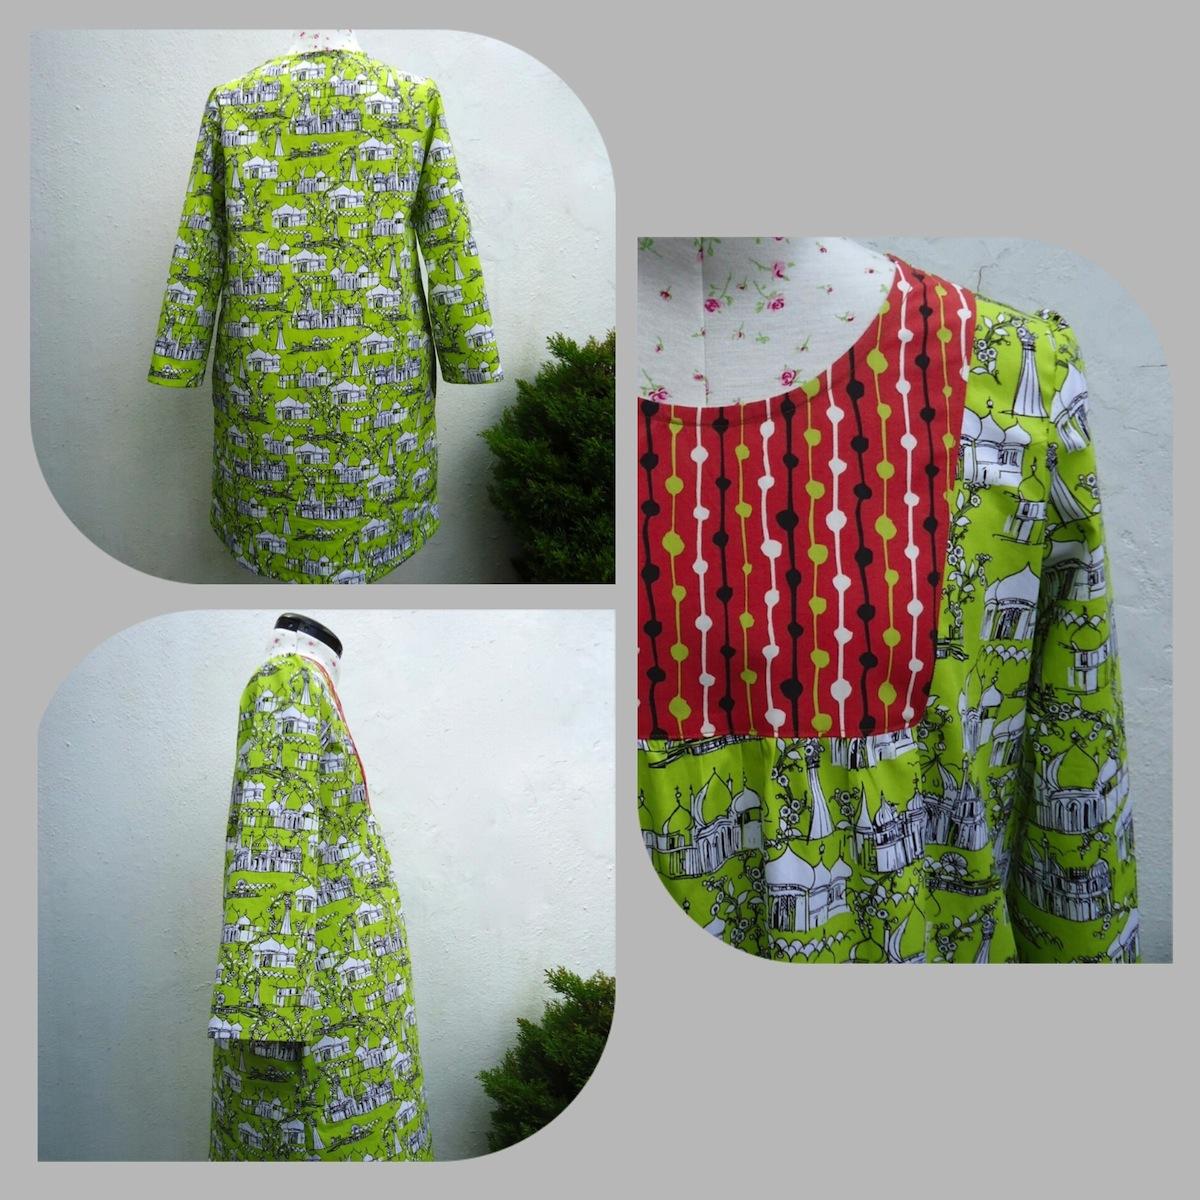 Wiksten Tova dress in Brighton Pavilion and Hemingway fabrics